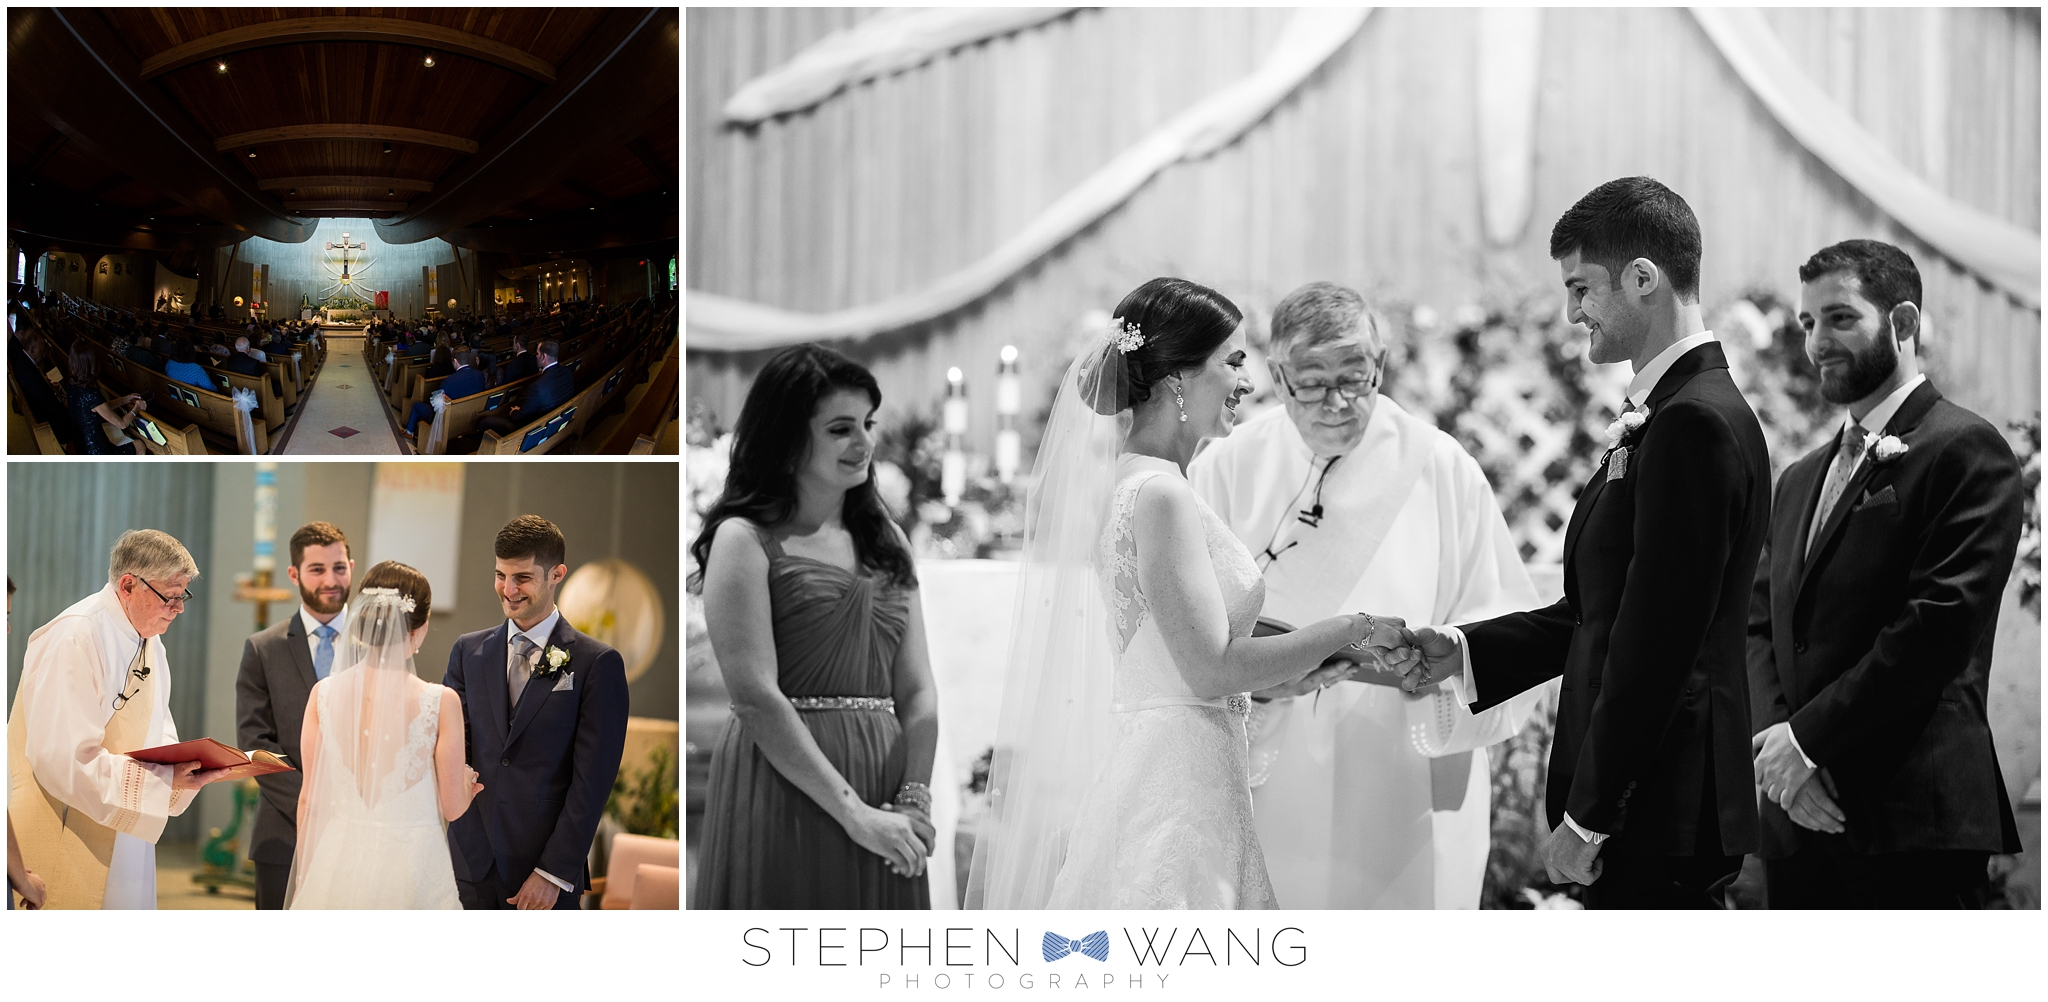 Stephen Wang Photography Shorehaven Norwalk CT Wedding Photographer connecticut shoreline shore haven - 19.jpg